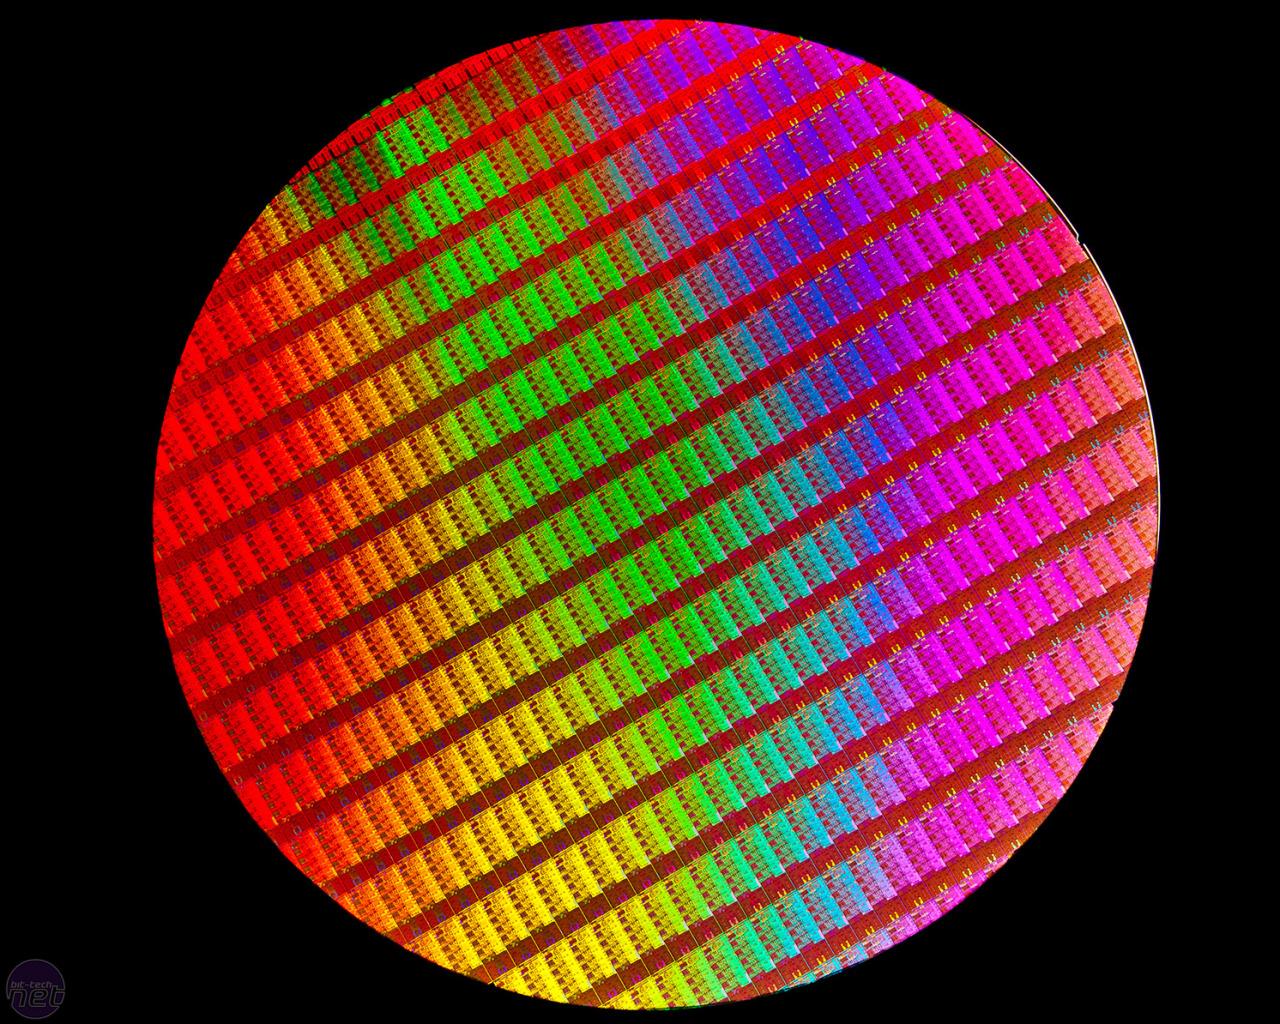 Intel Core i7 4770K Haswell CPU Review bit technet 1280x1024